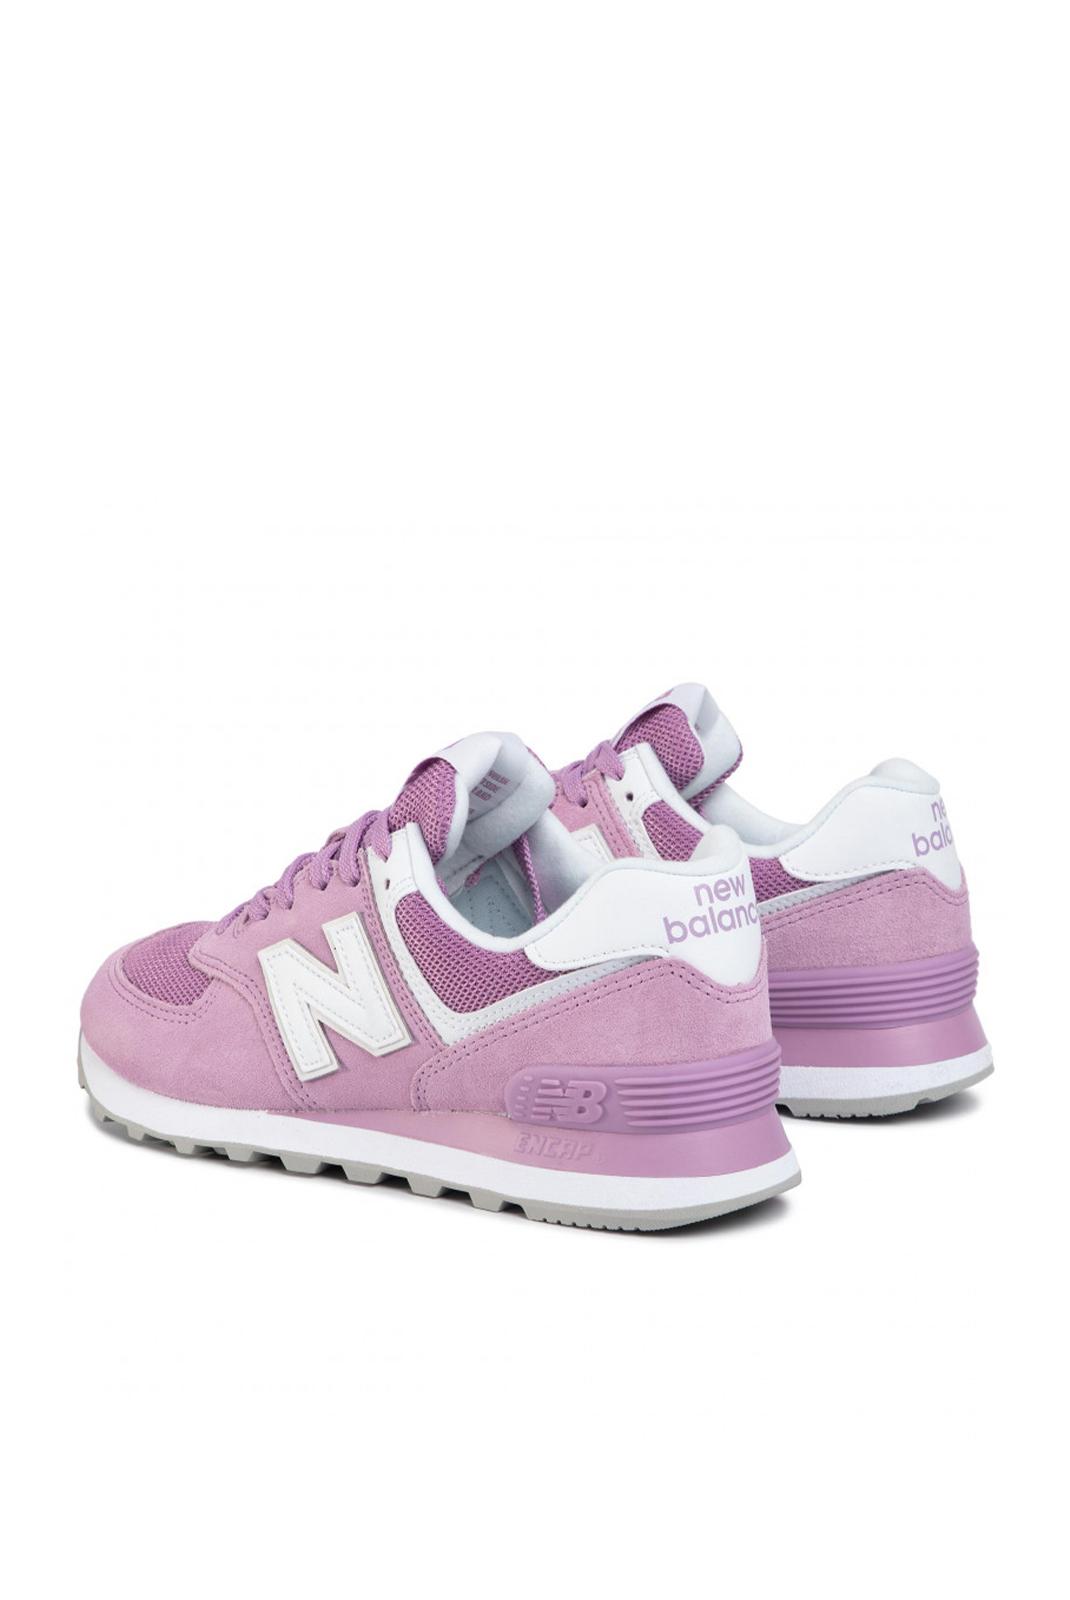 Chaussures  New balance WL574OAC oac